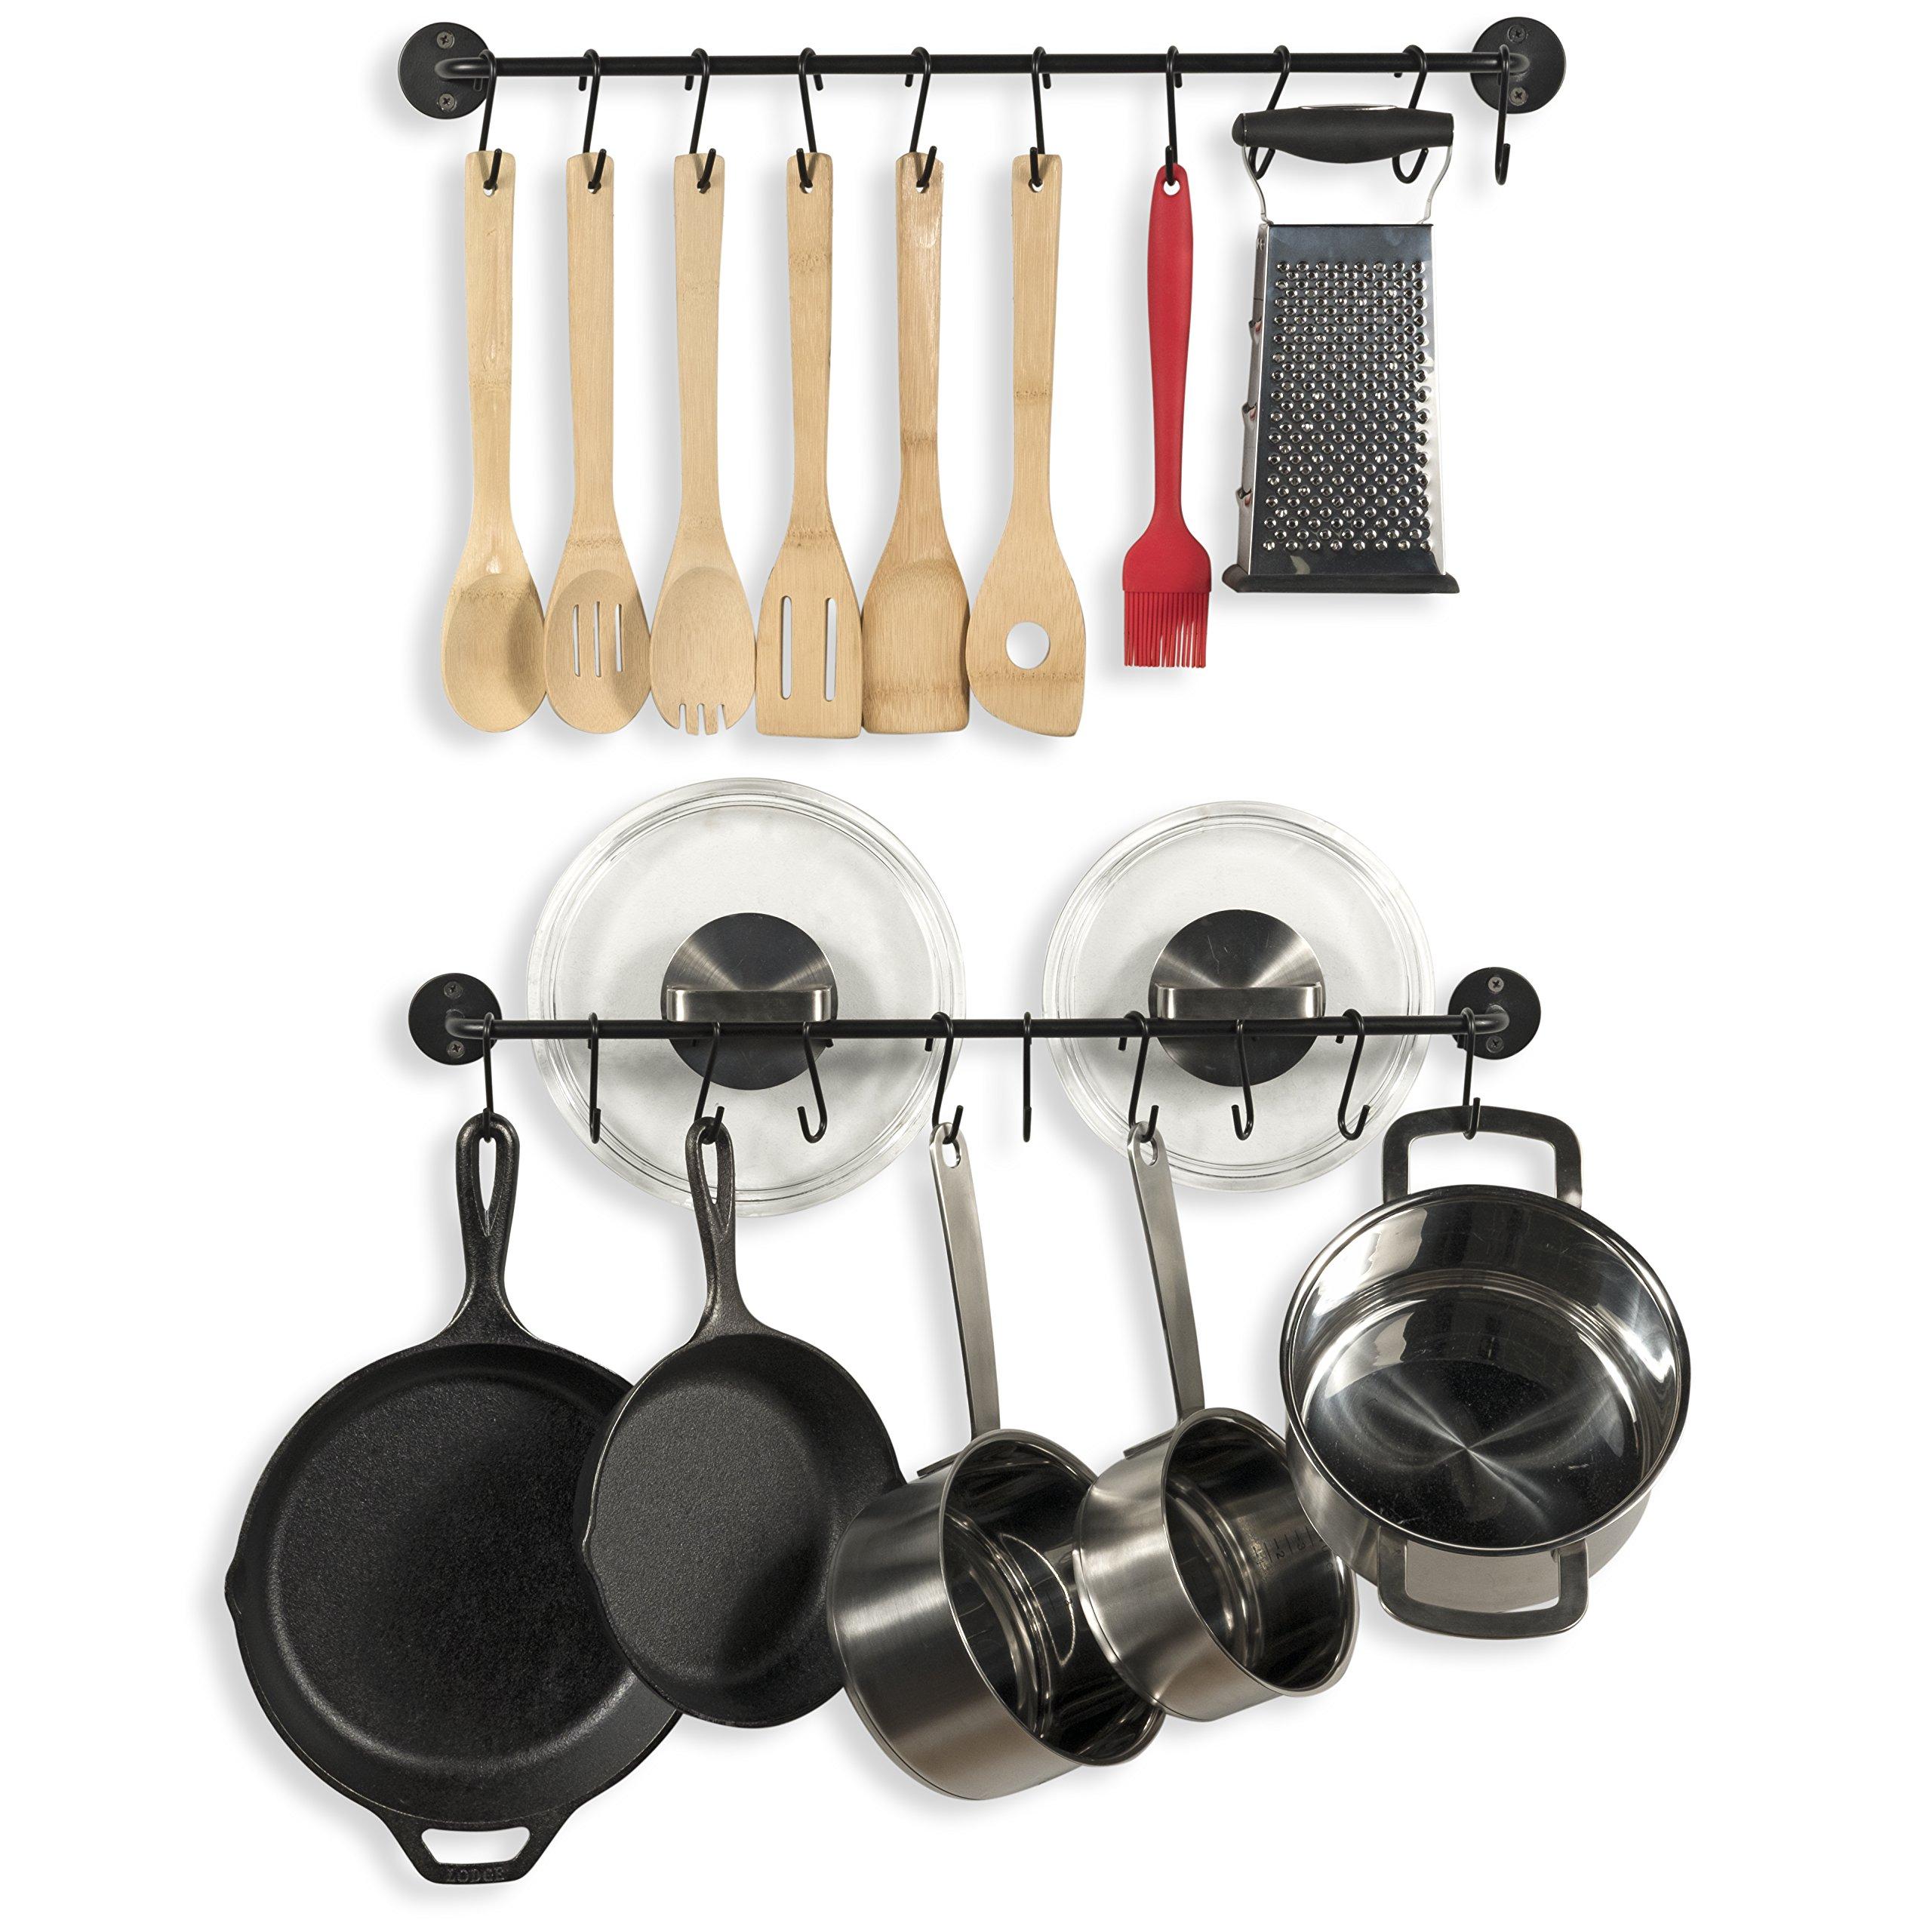 Wallniture Kitchen Pot Racks Set of 2 Wall Rails and 20 Hooks - Solid Steel - Hanging Utensil Organizer 24 Inch Black